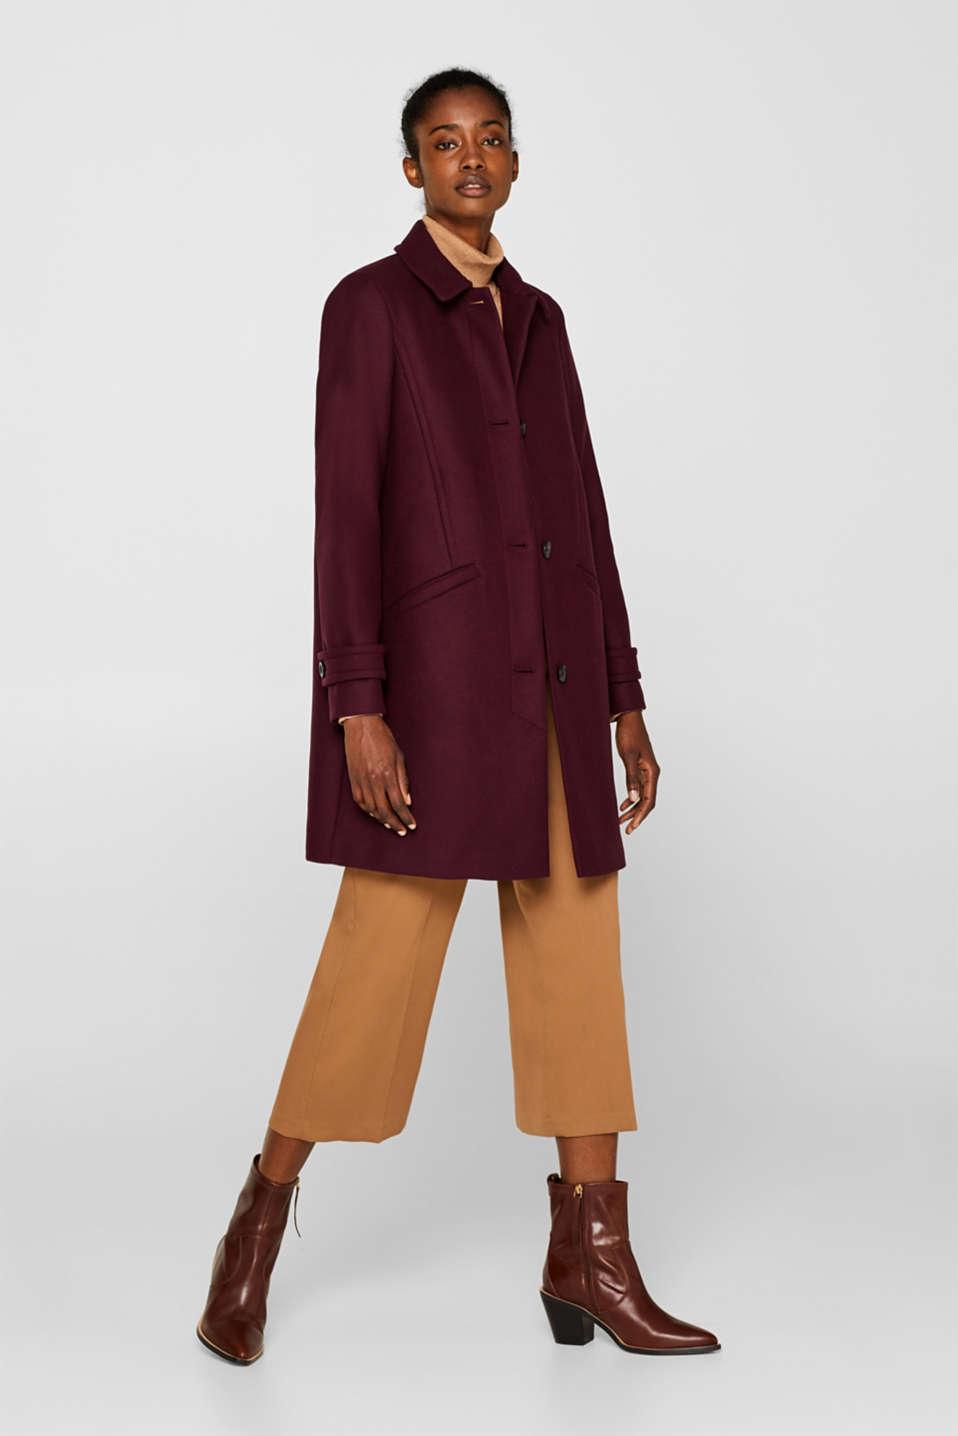 Wool blend coat, BORDEAUX RED, detail image number 1